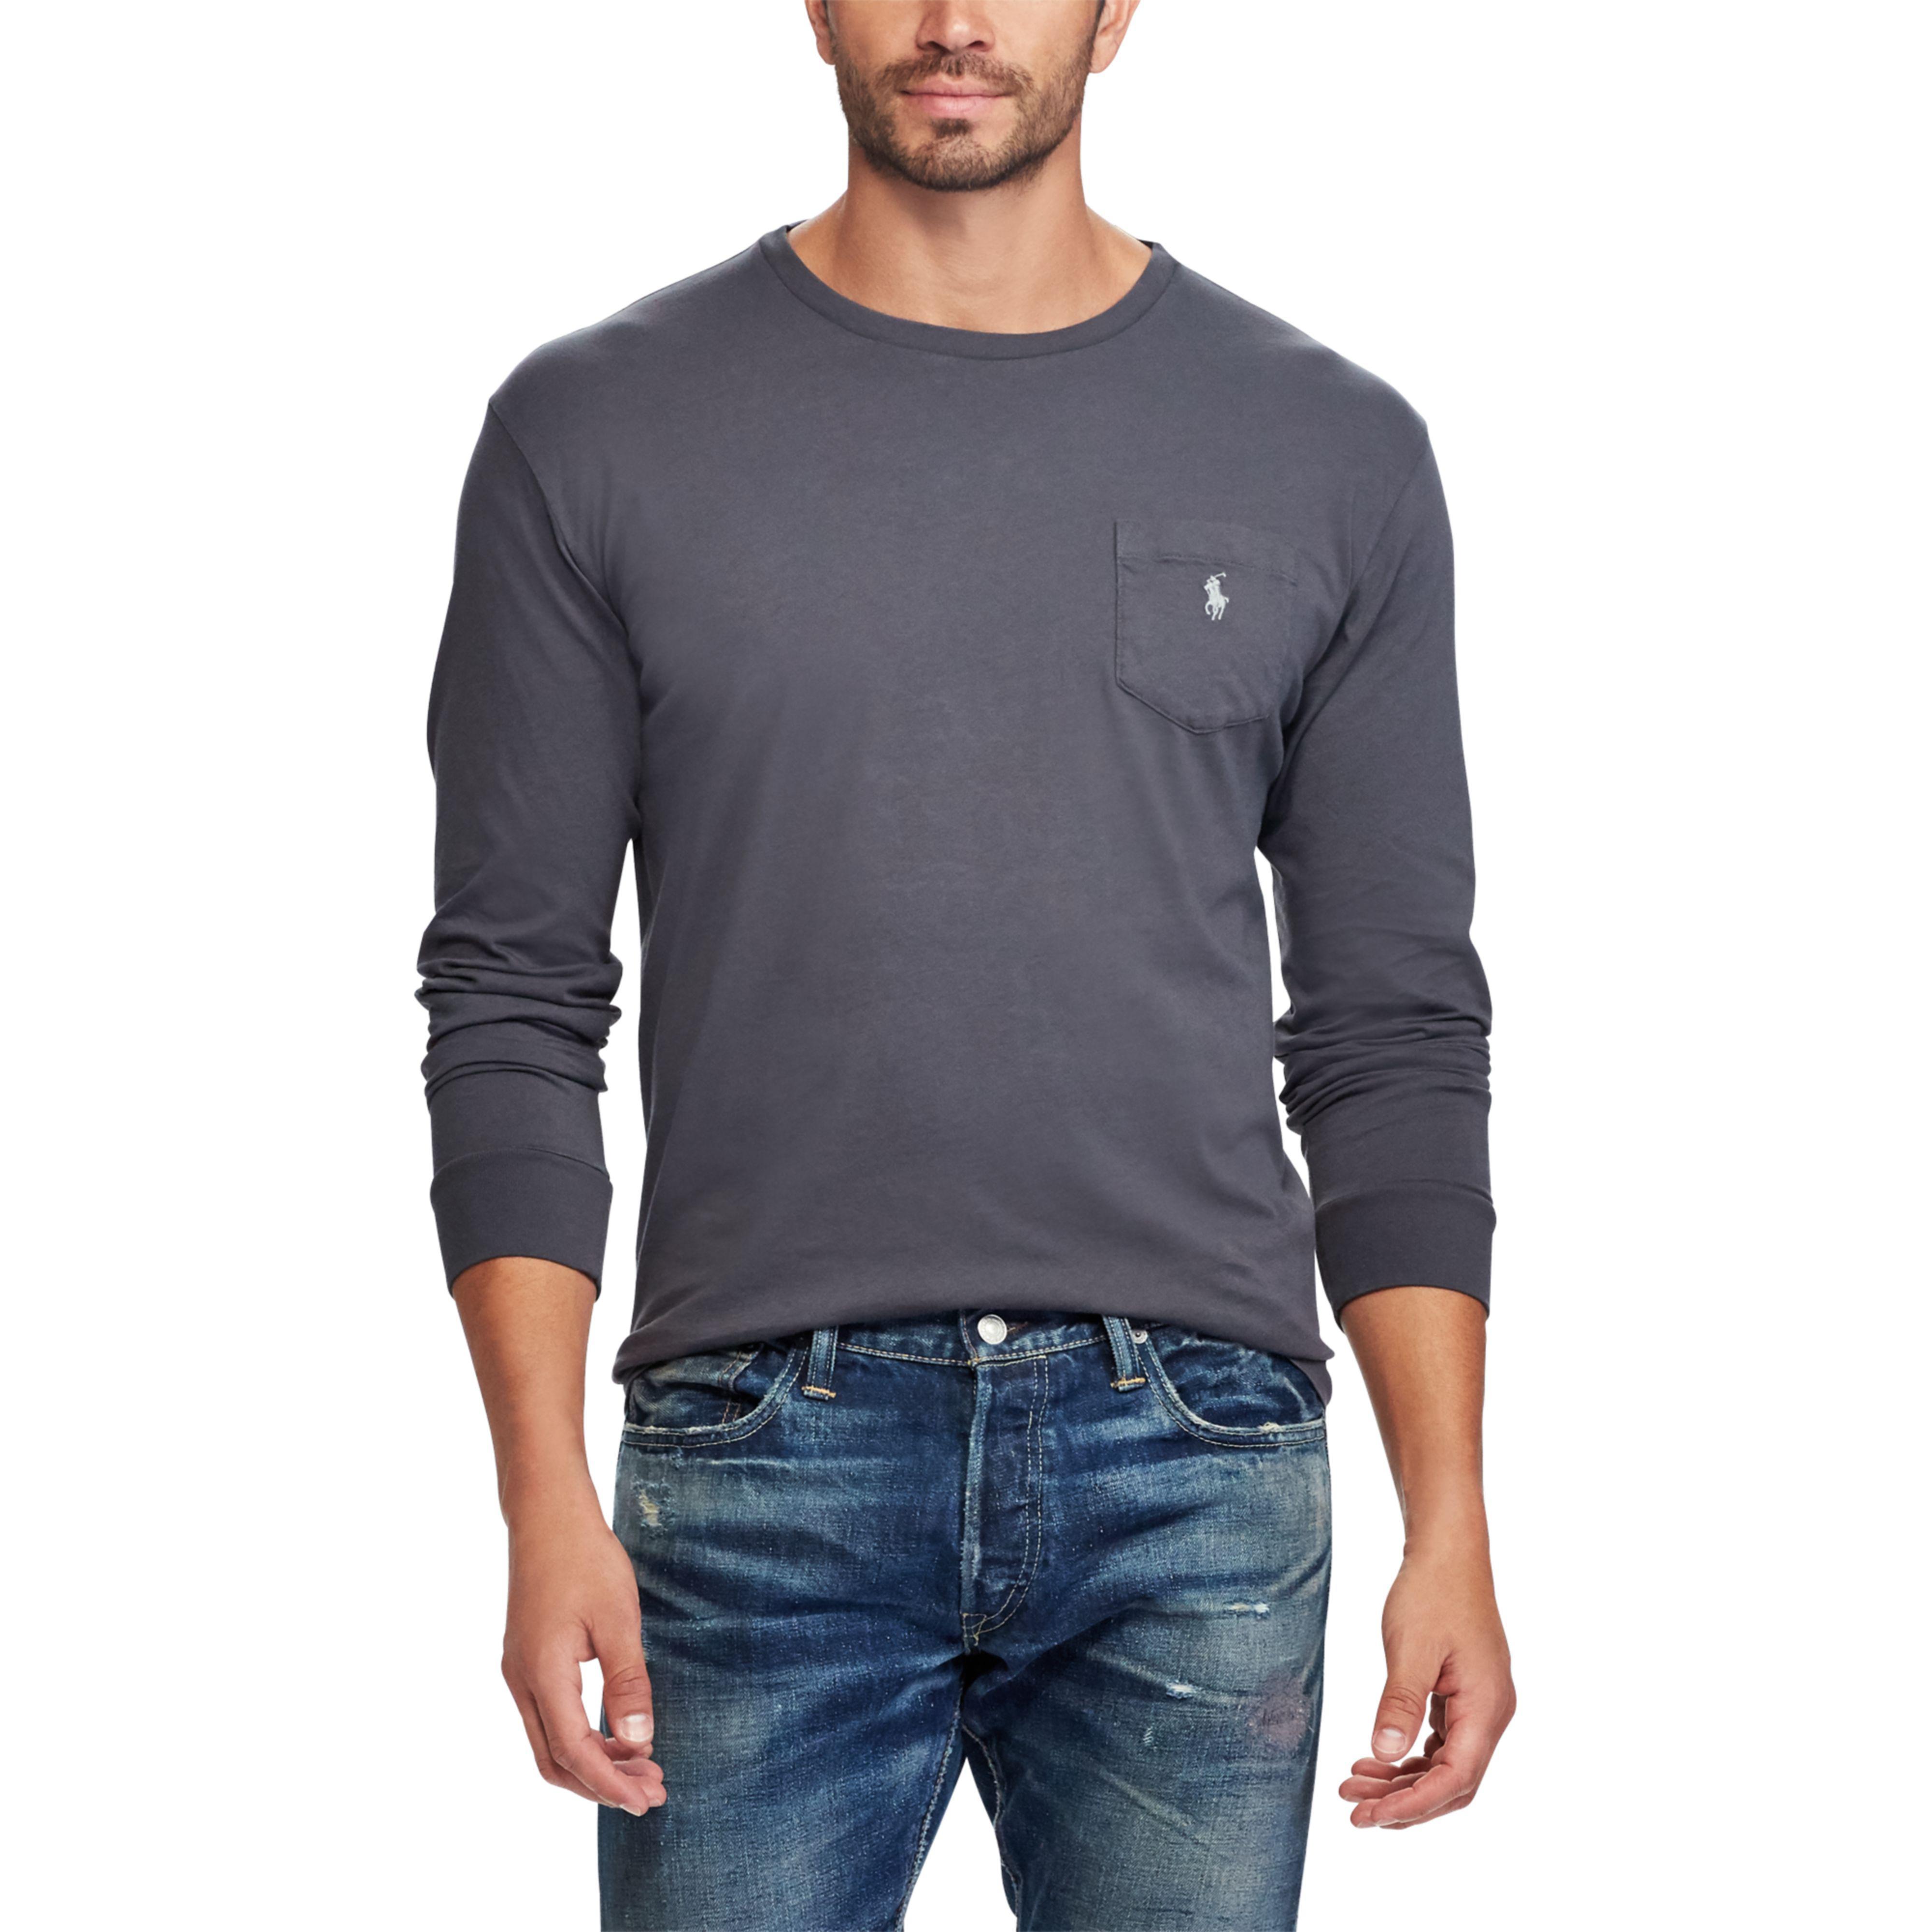 bb688fc95a1d Lyst - Polo Ralph Lauren Custom Slim Fit Cotton T-shirt in Gray for Men